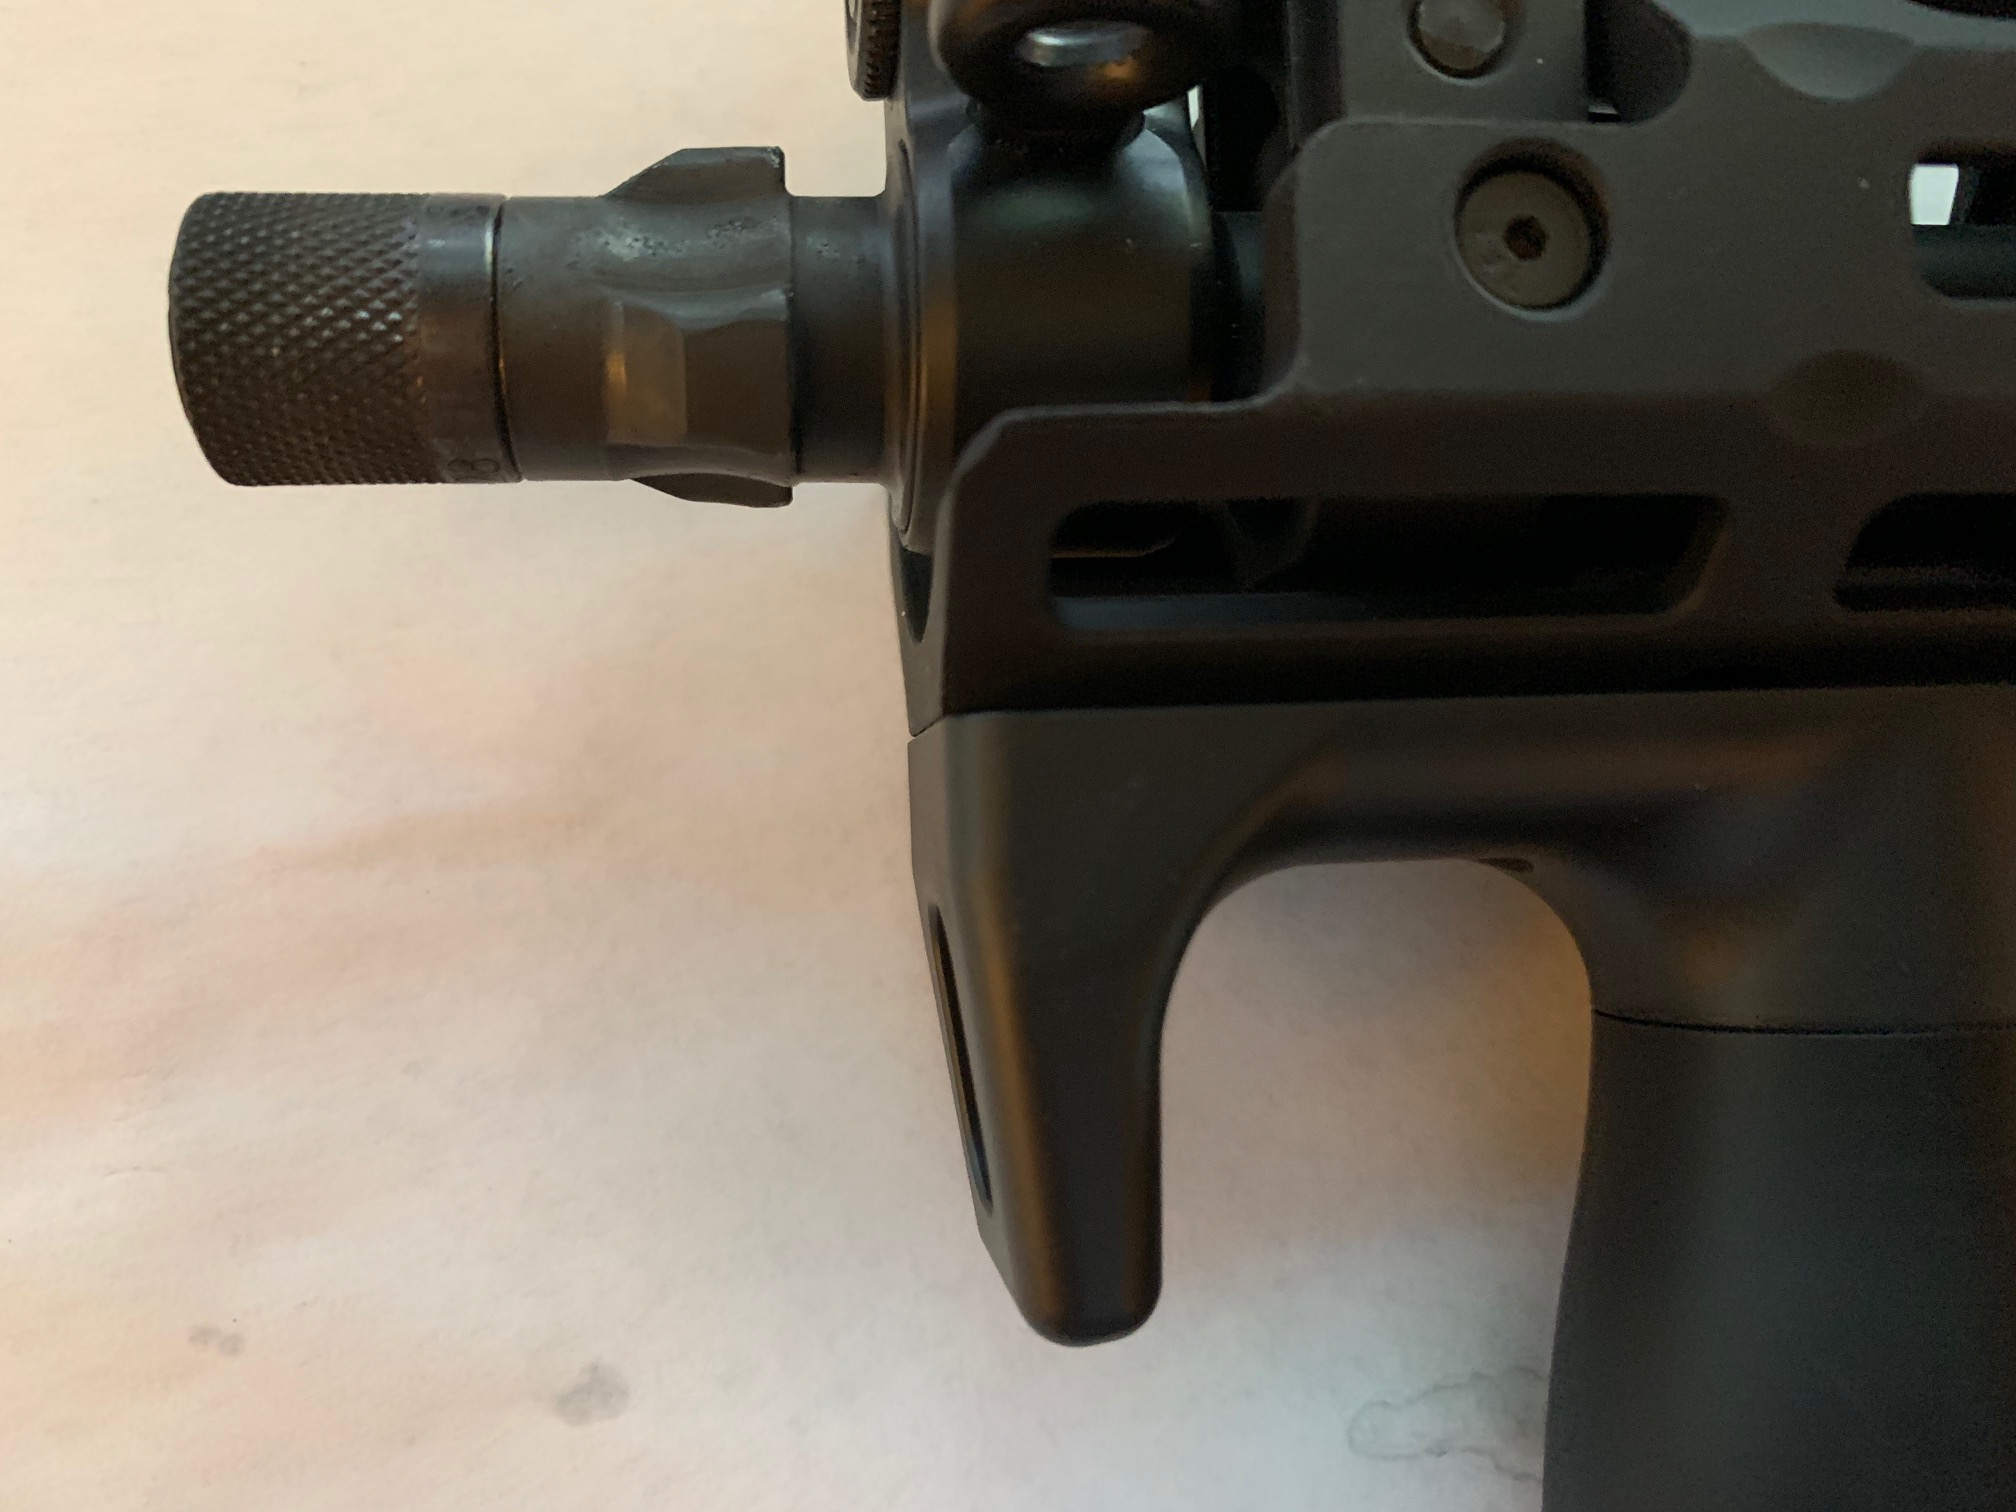 EDIT with Photos: Review of A3 Tactical Vert Grip on MI M-LOK MP5 Handguard-img_3861.jpg